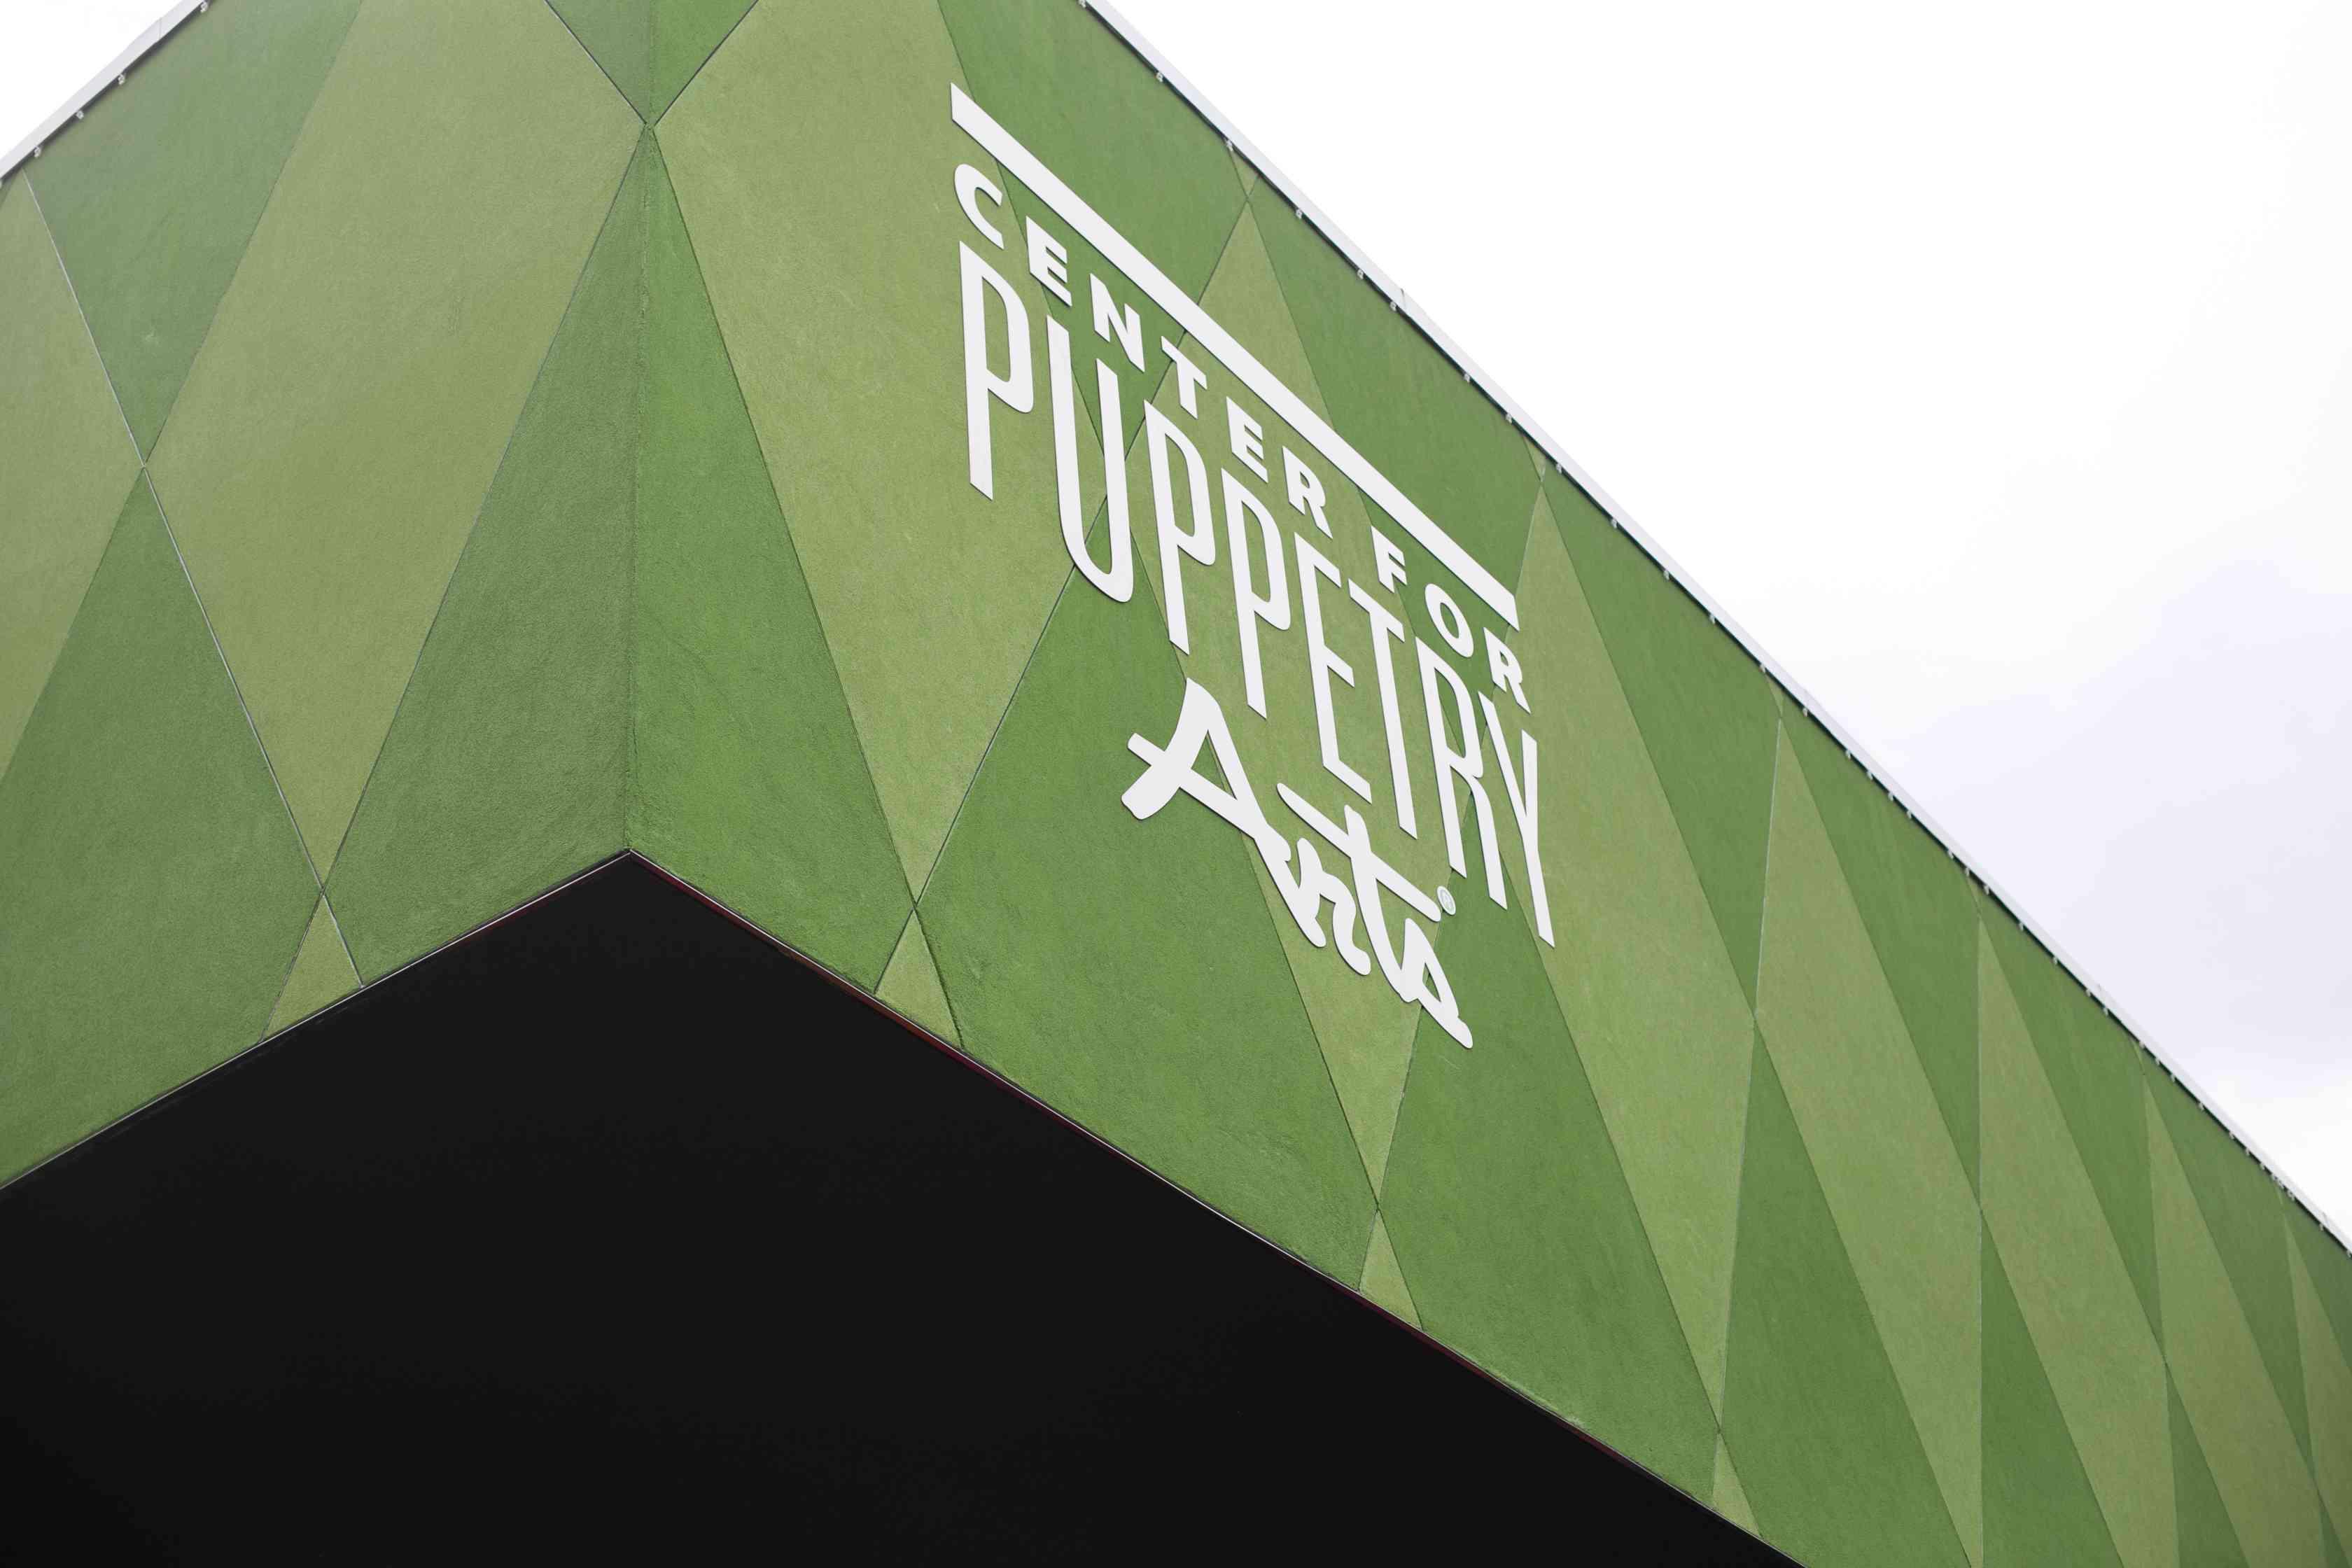 Center for Puppetry Arts in Atlanta, GA